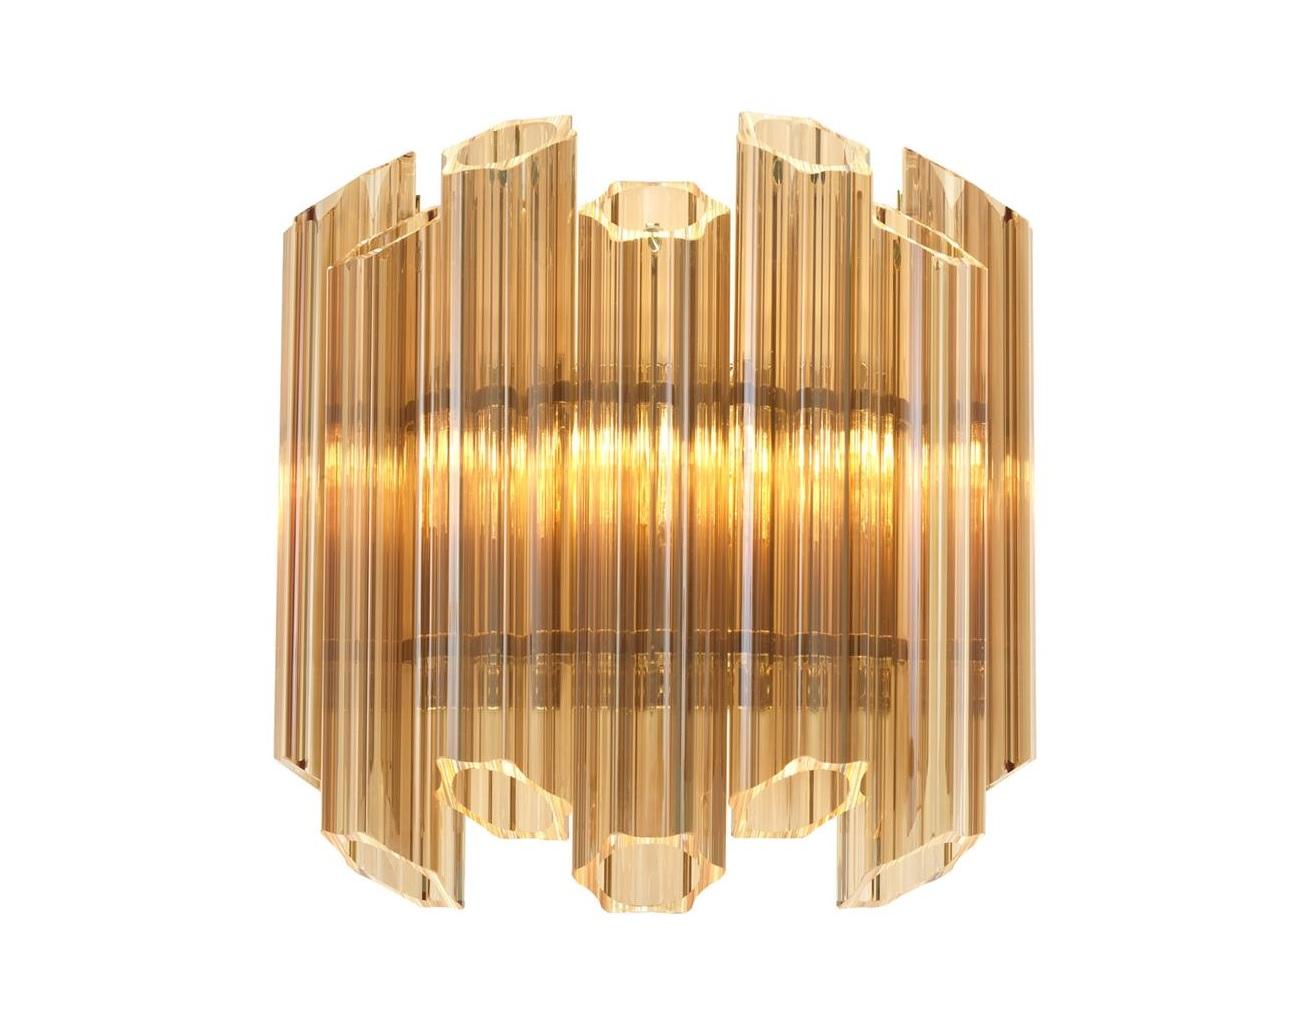 Настенный светильник VittoriaБра<br>Вид цоколя: E14Мощность: 40WКоличество ламп: 2 (нет в комплекте)<br><br>kit: None<br>gender: None